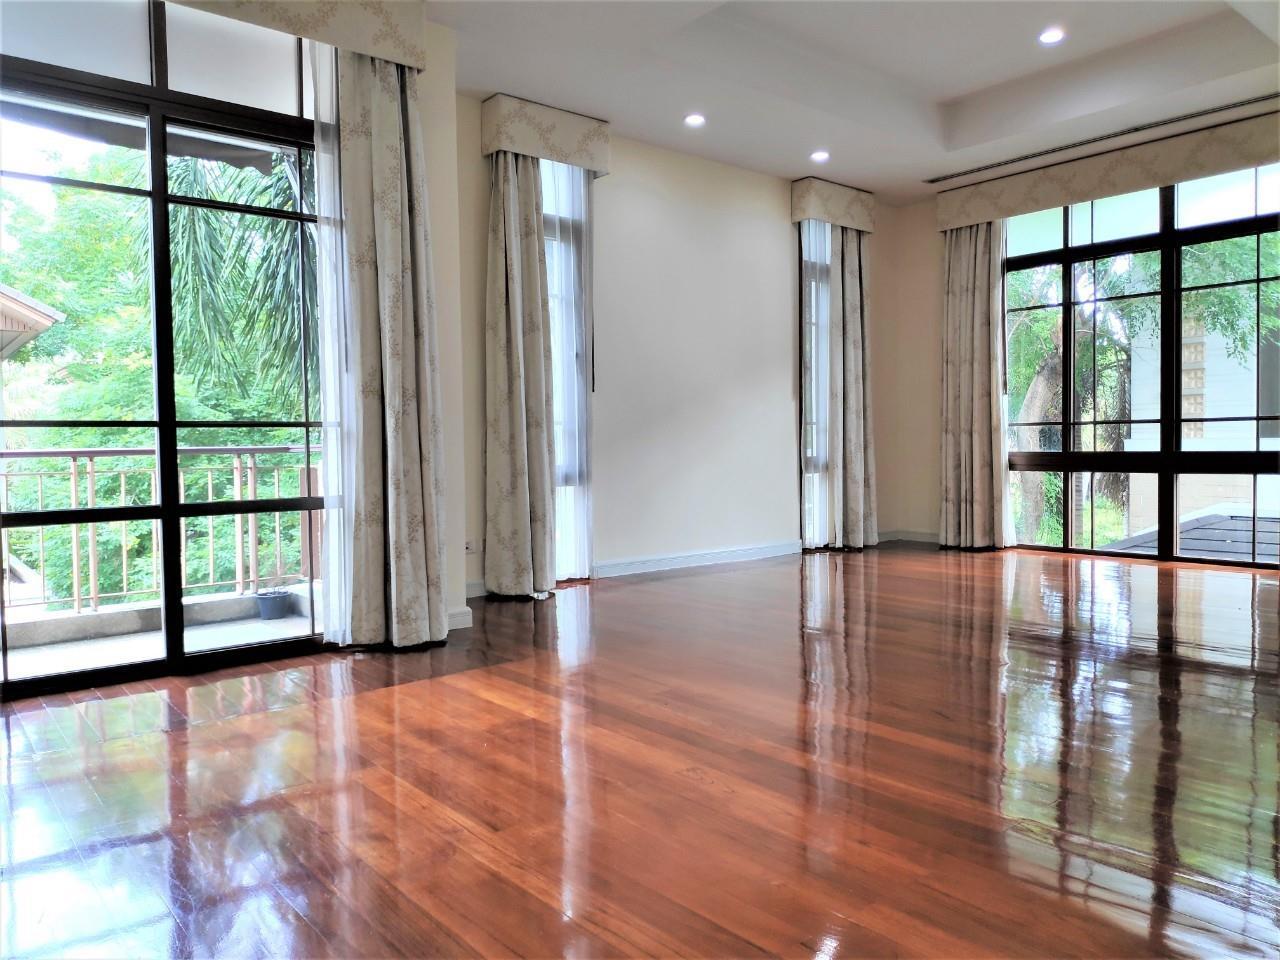 Agent - Natchga Boonkrong  Agency's For Rent House 4 Bedrooms Baan Sansiri Sukhumvit 67 26